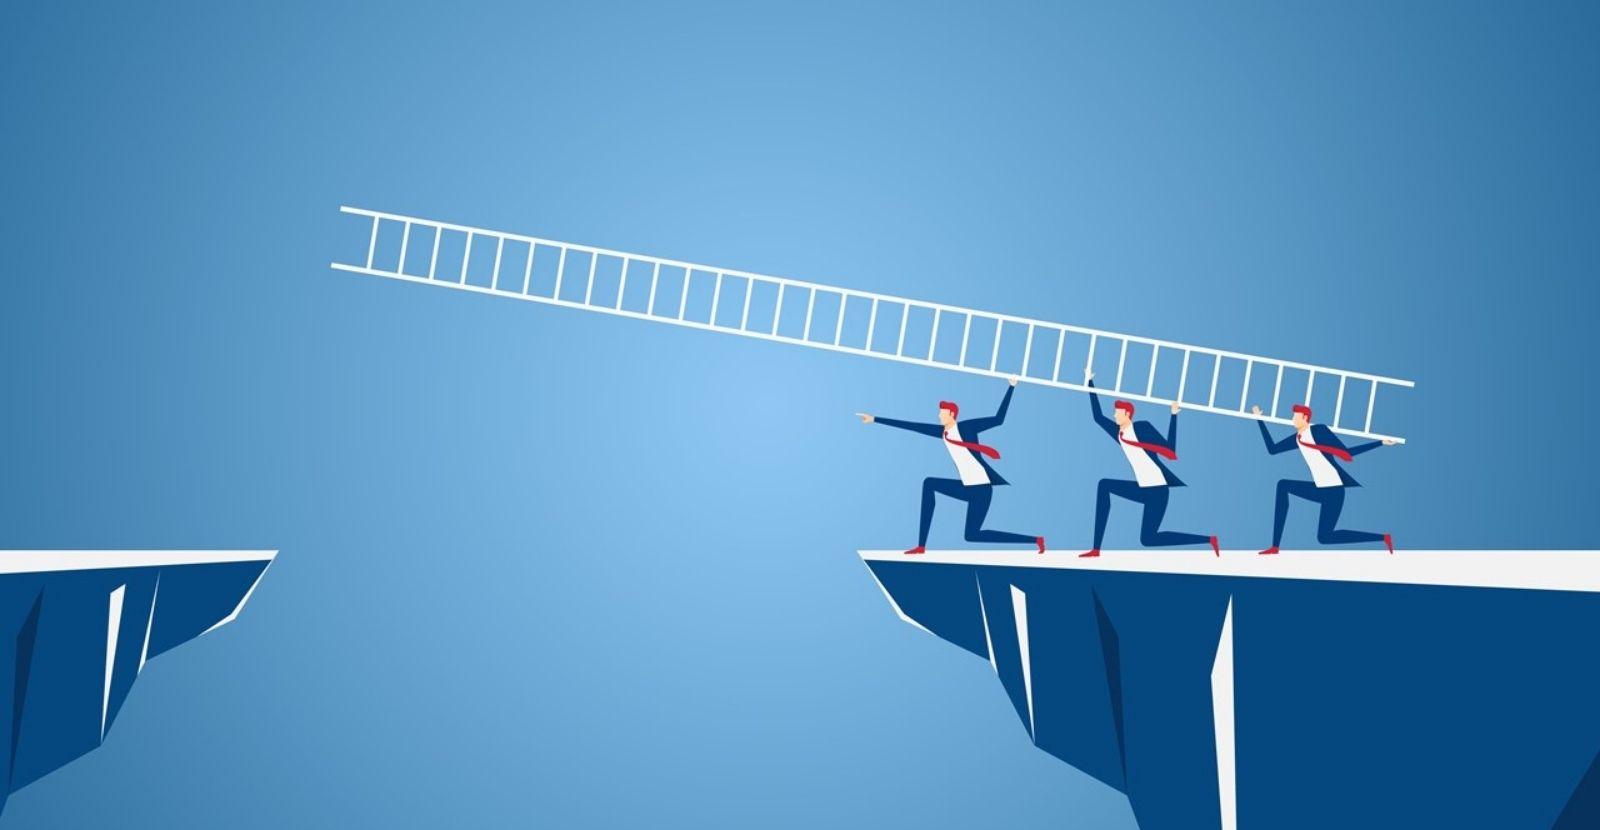 Bridging the gap between idea and industry - BASF Venture Capital